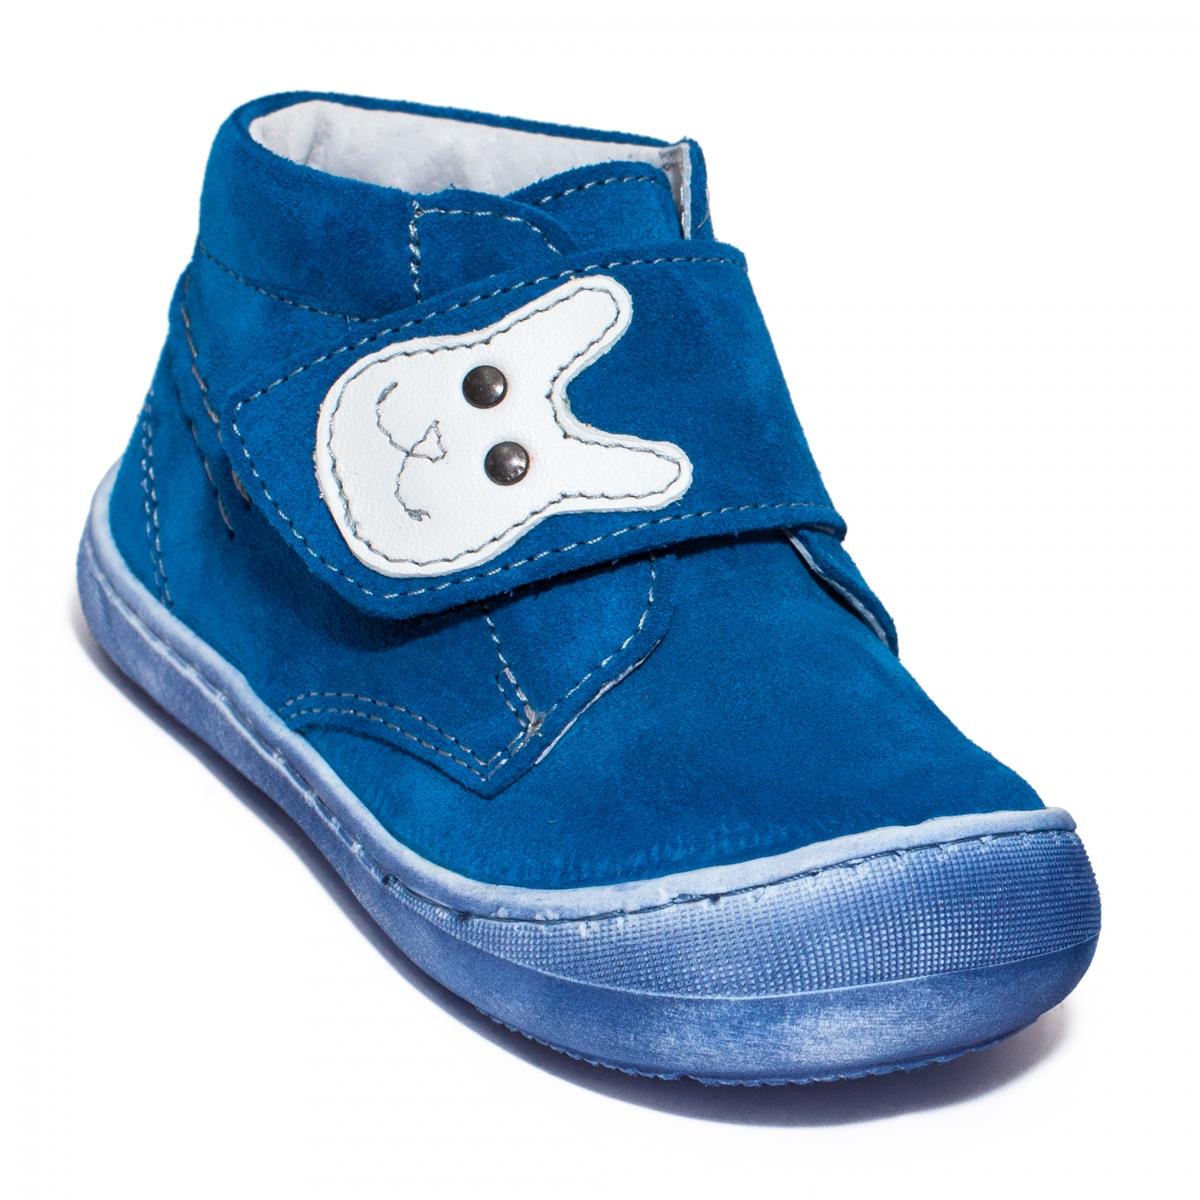 Ghetute baieti cu talpa flexibila pj shoes Teddy blu velur 18-25